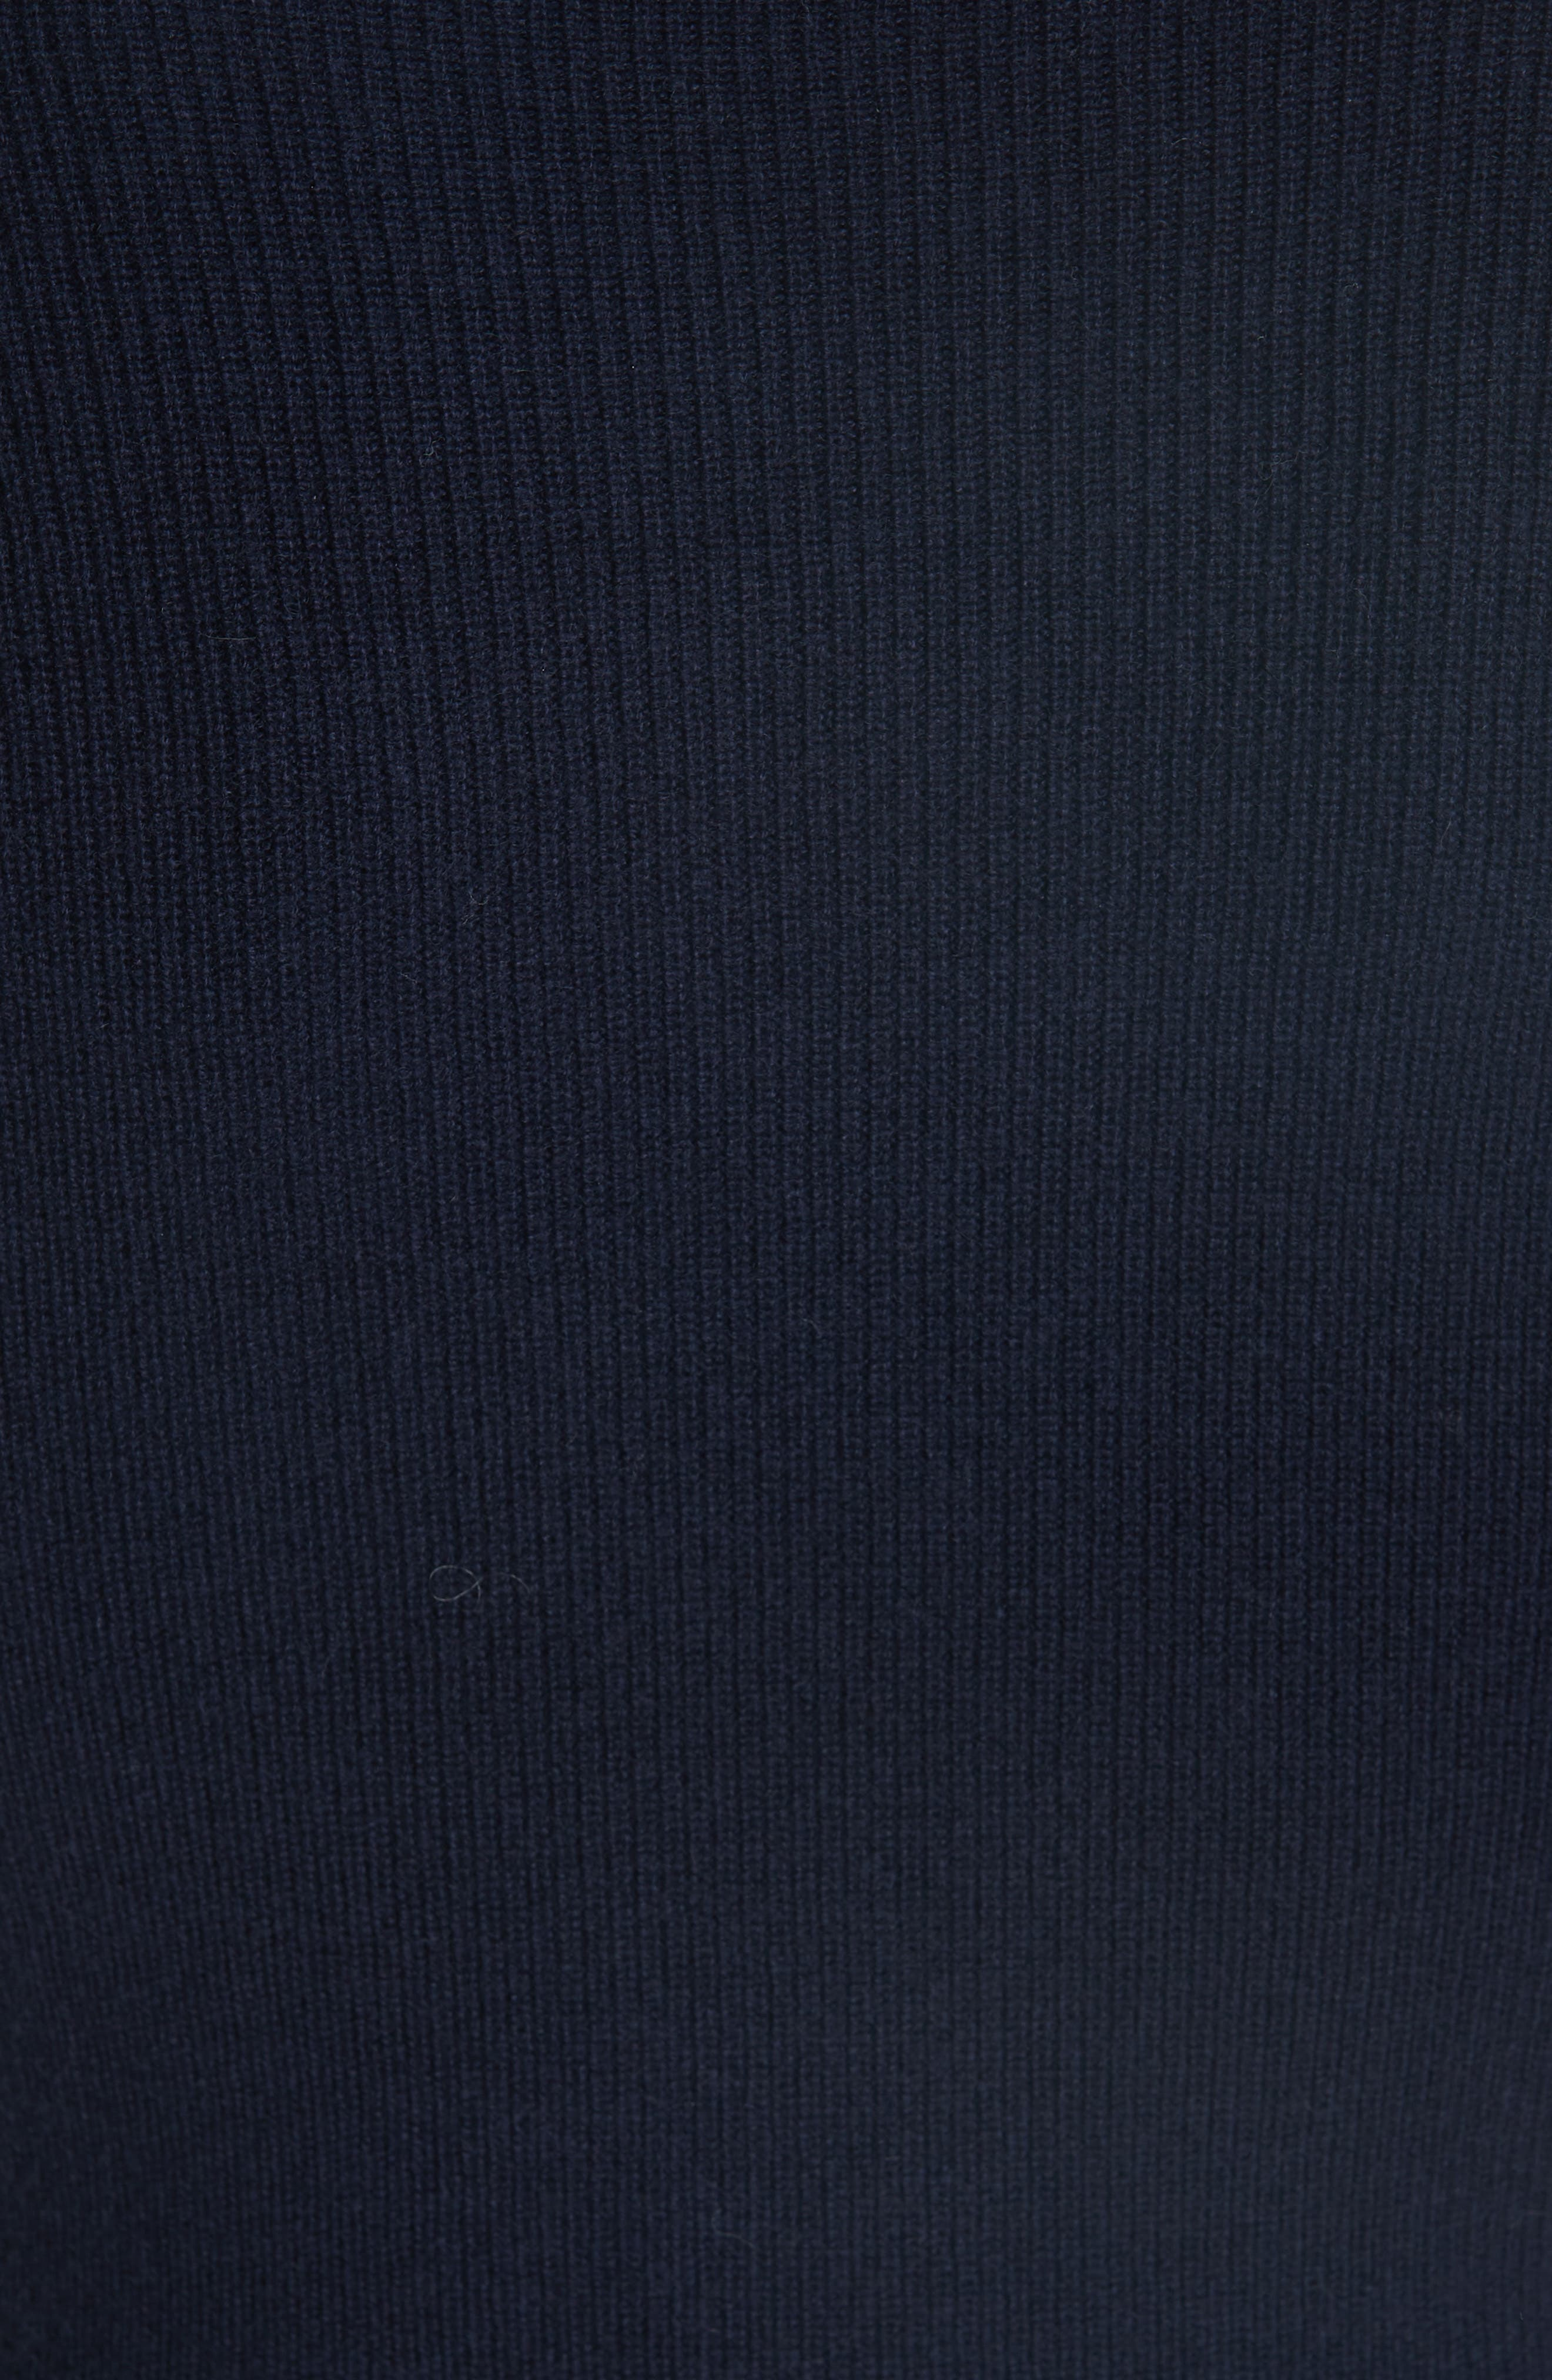 Bobbe Wool Blend Peplum Sweater,                             Alternate thumbnail 5, color,                             410